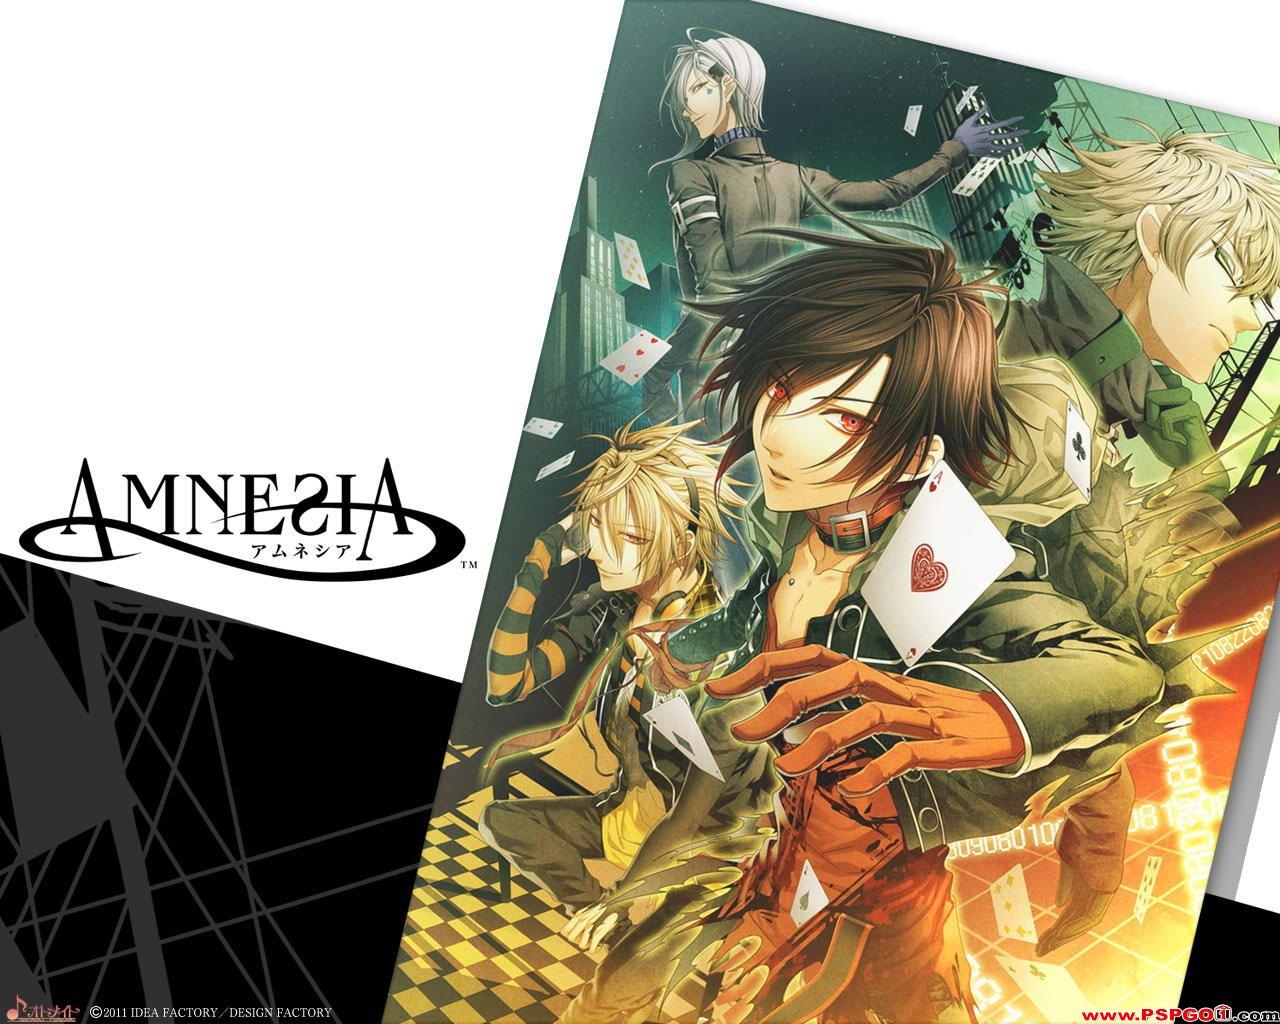 Amnesia Offical Wallpaper 1 Amnesia アムネシア Wallpaper Fanpop